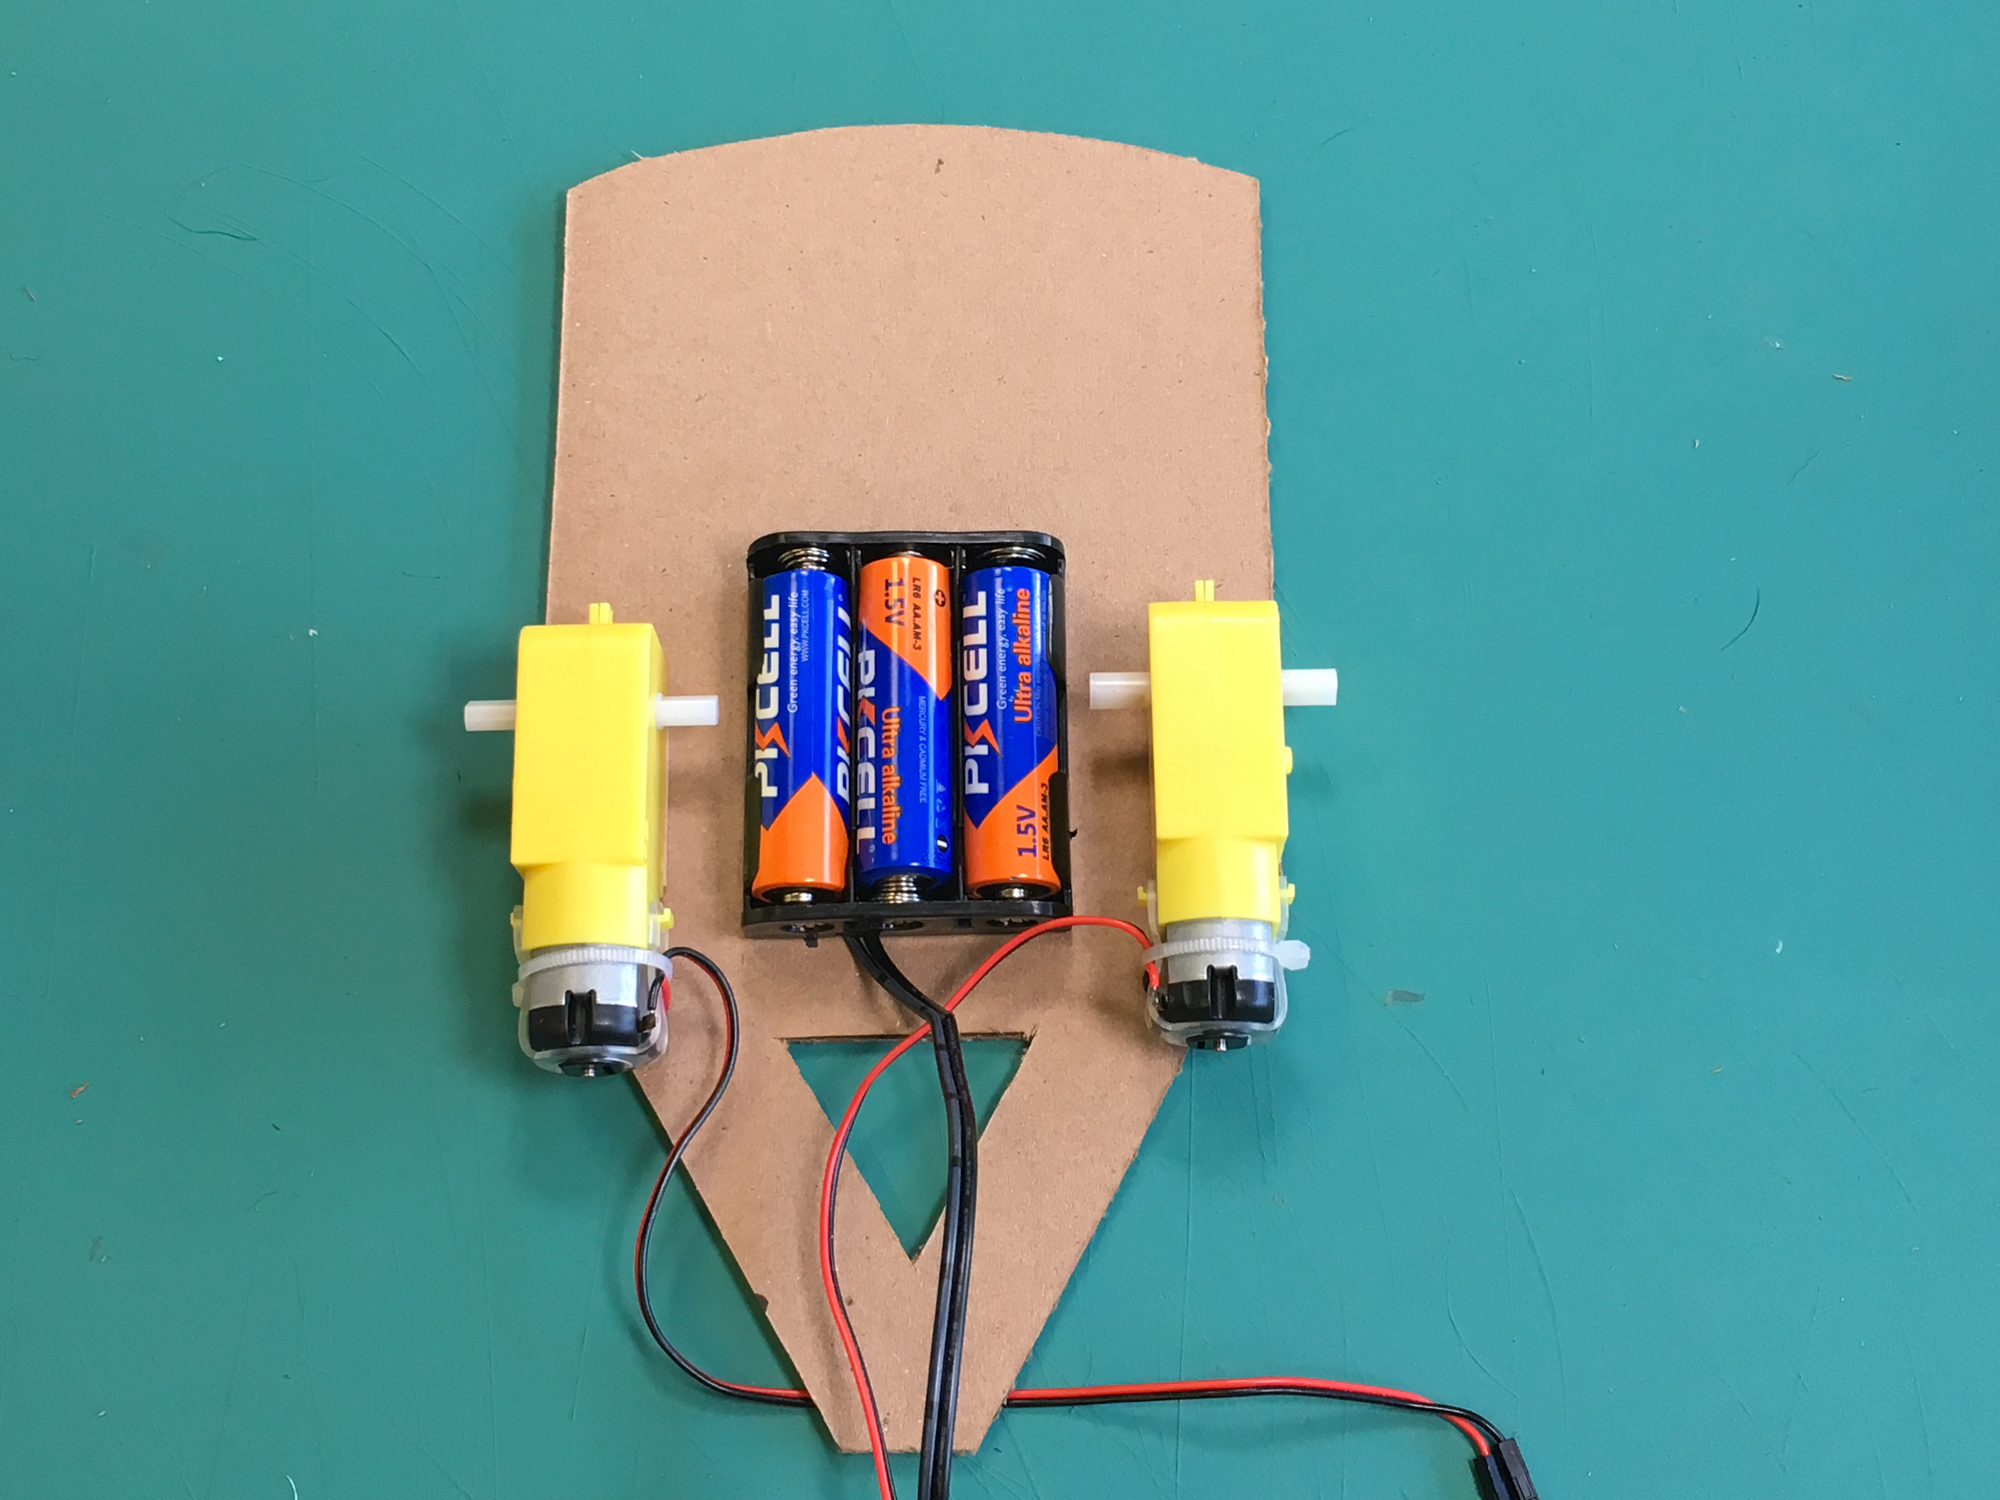 robotics___cnc_bumperBot_IMG_3474_2k.jpg